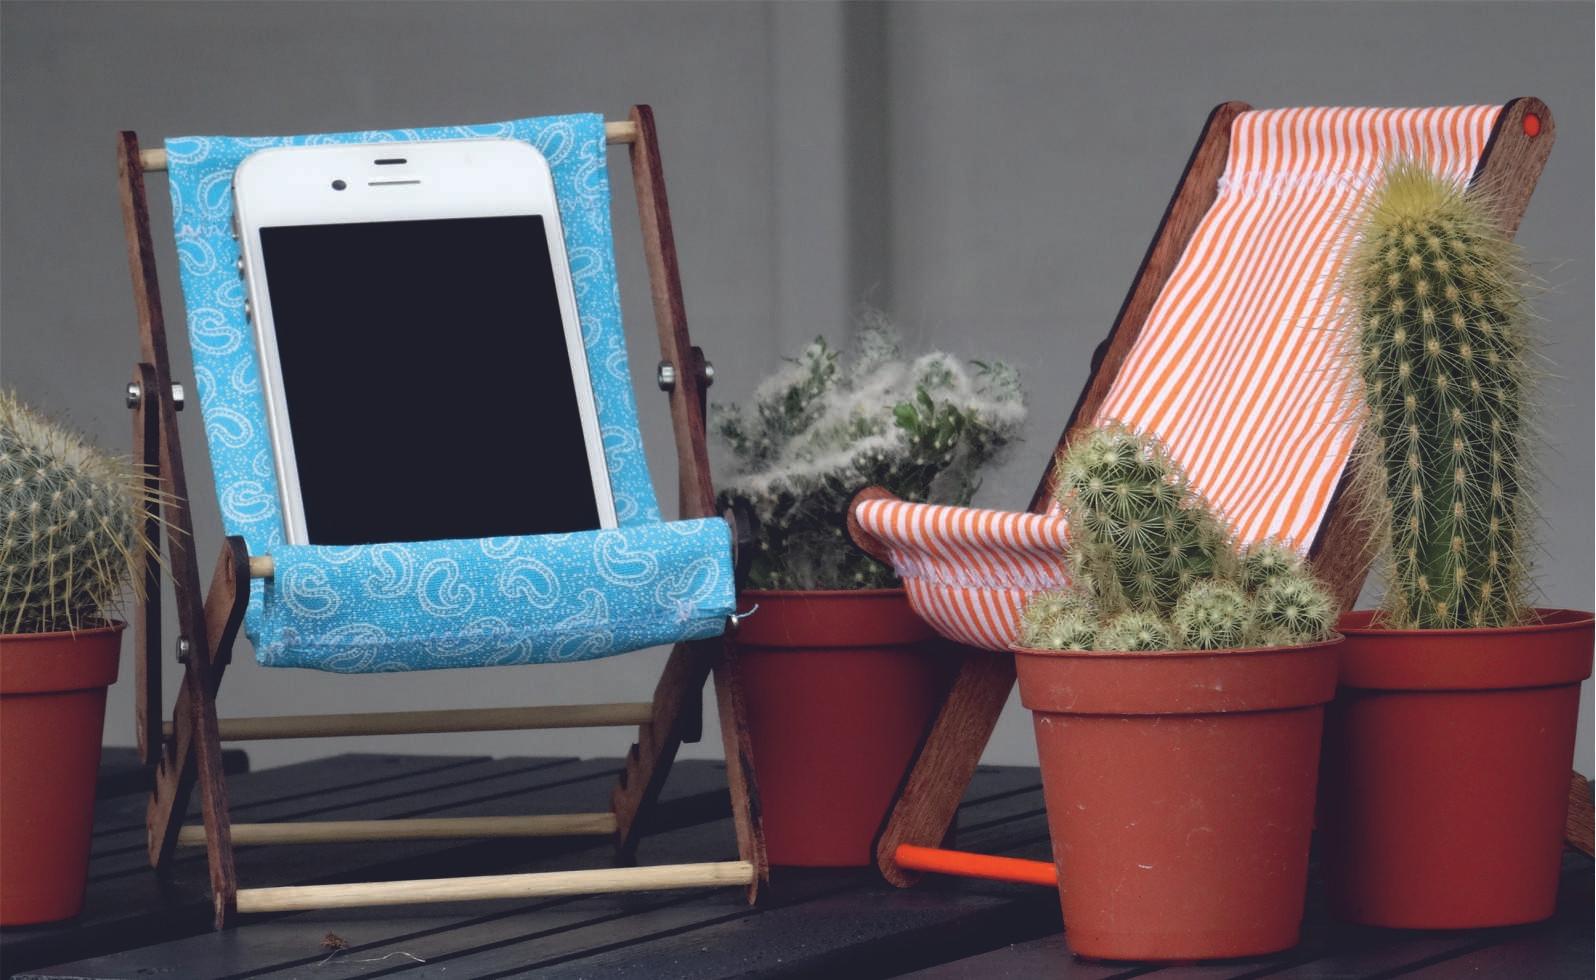 cacti & 2 chairs.jpg